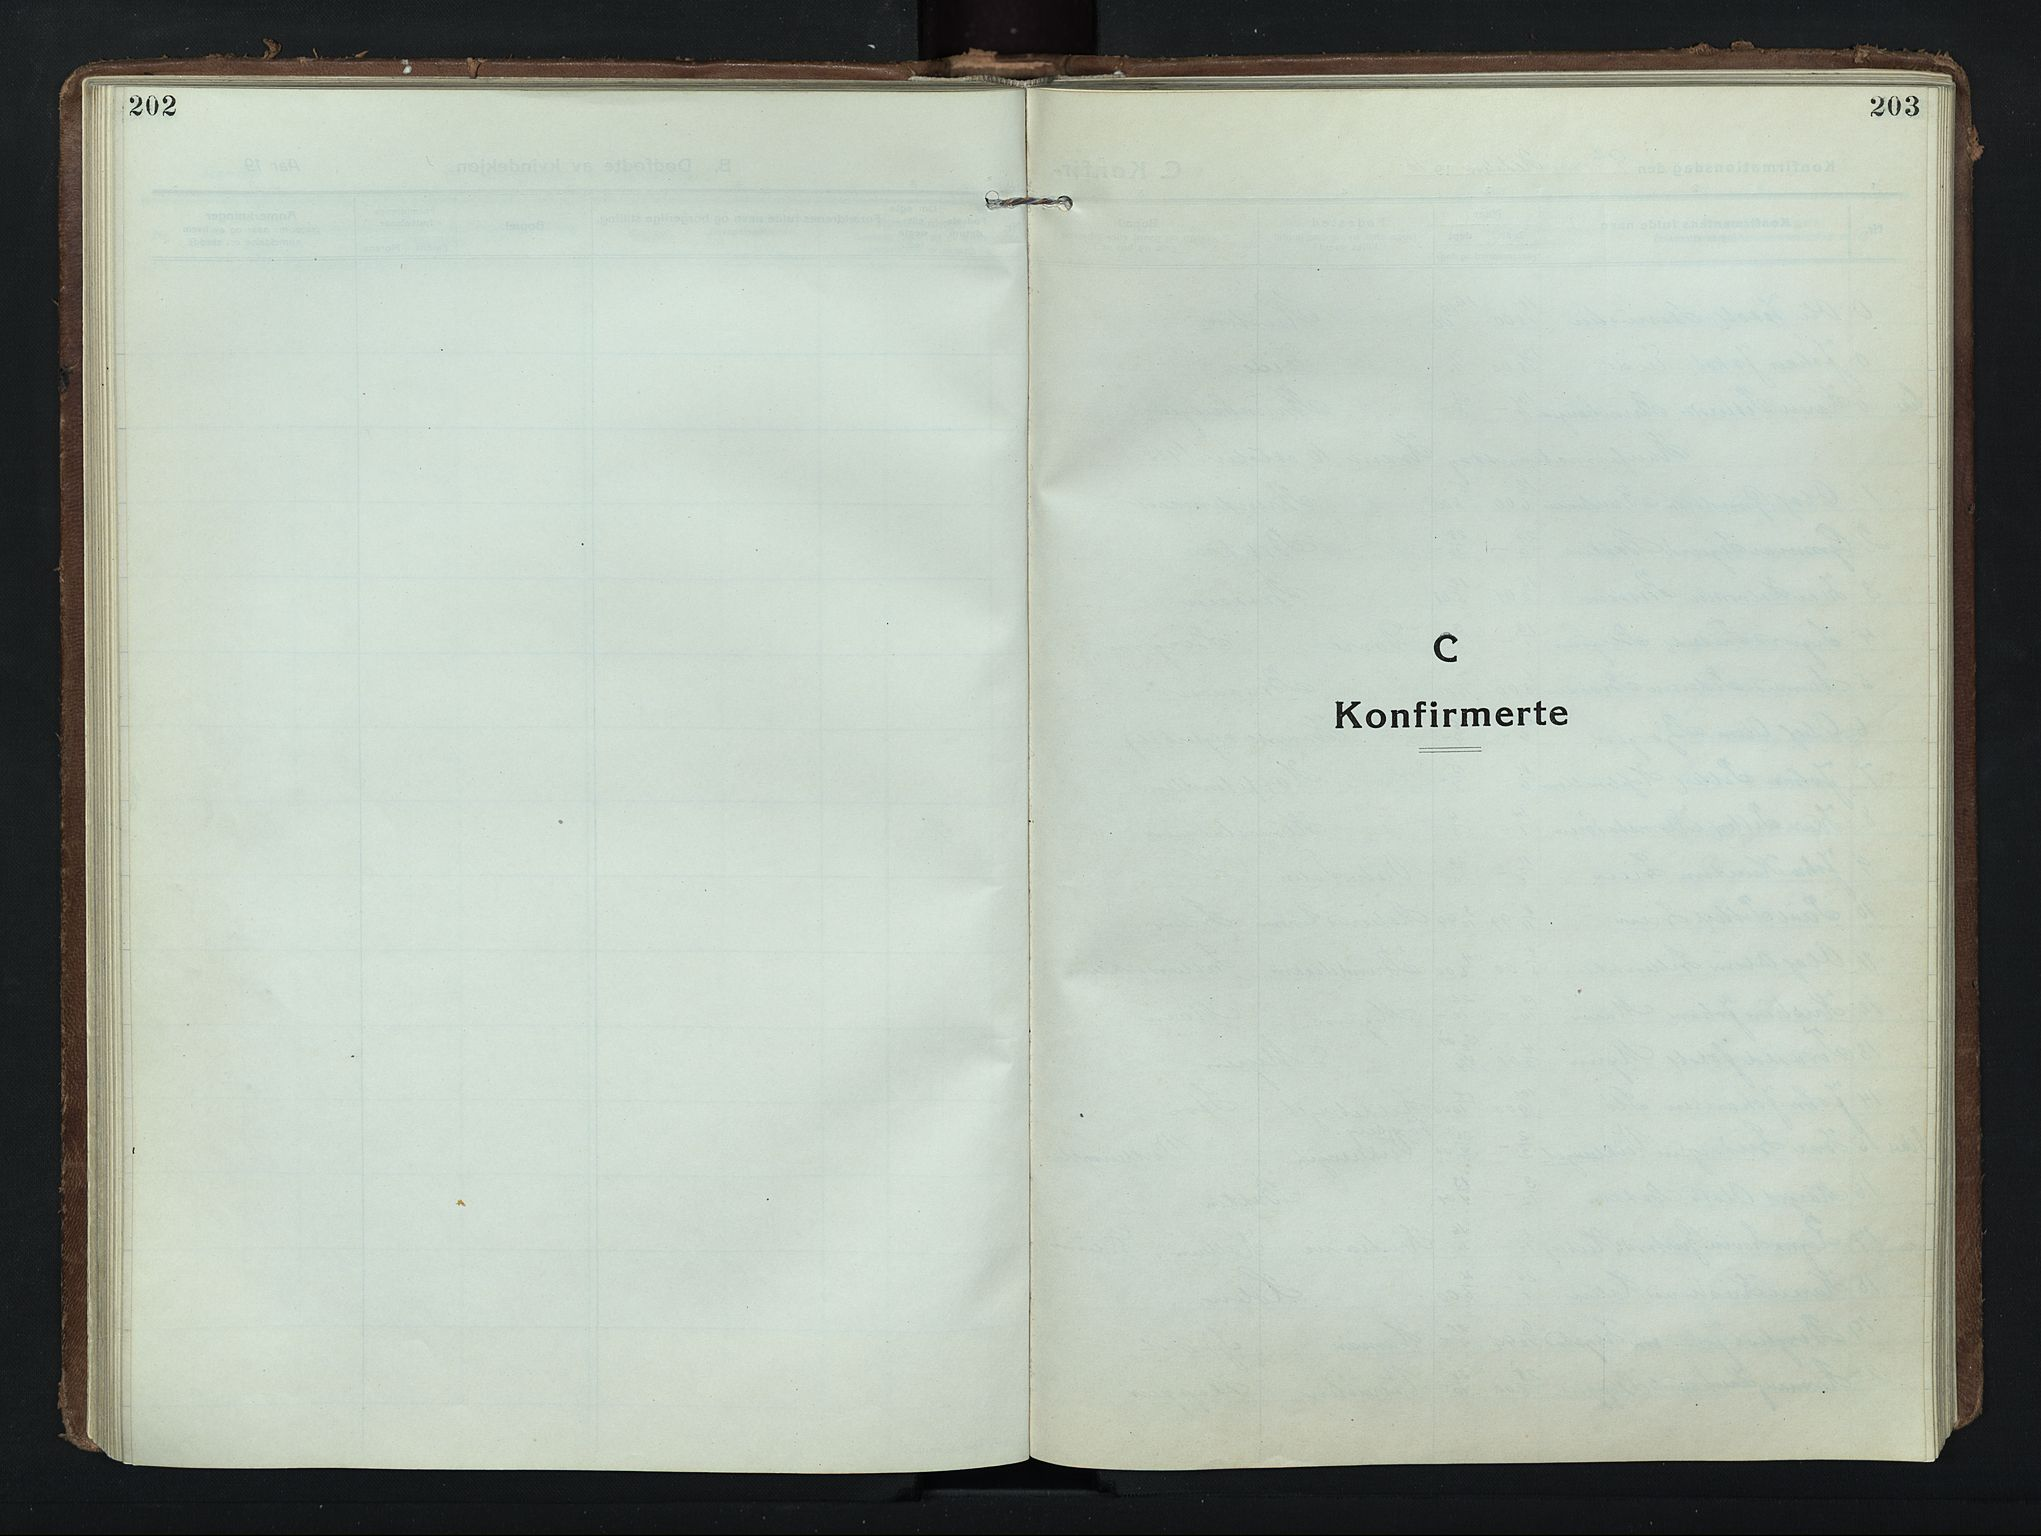 SAH, Nord-Fron prestekontor, Klokkerbok nr. 8, 1915-1948, s. 202-203